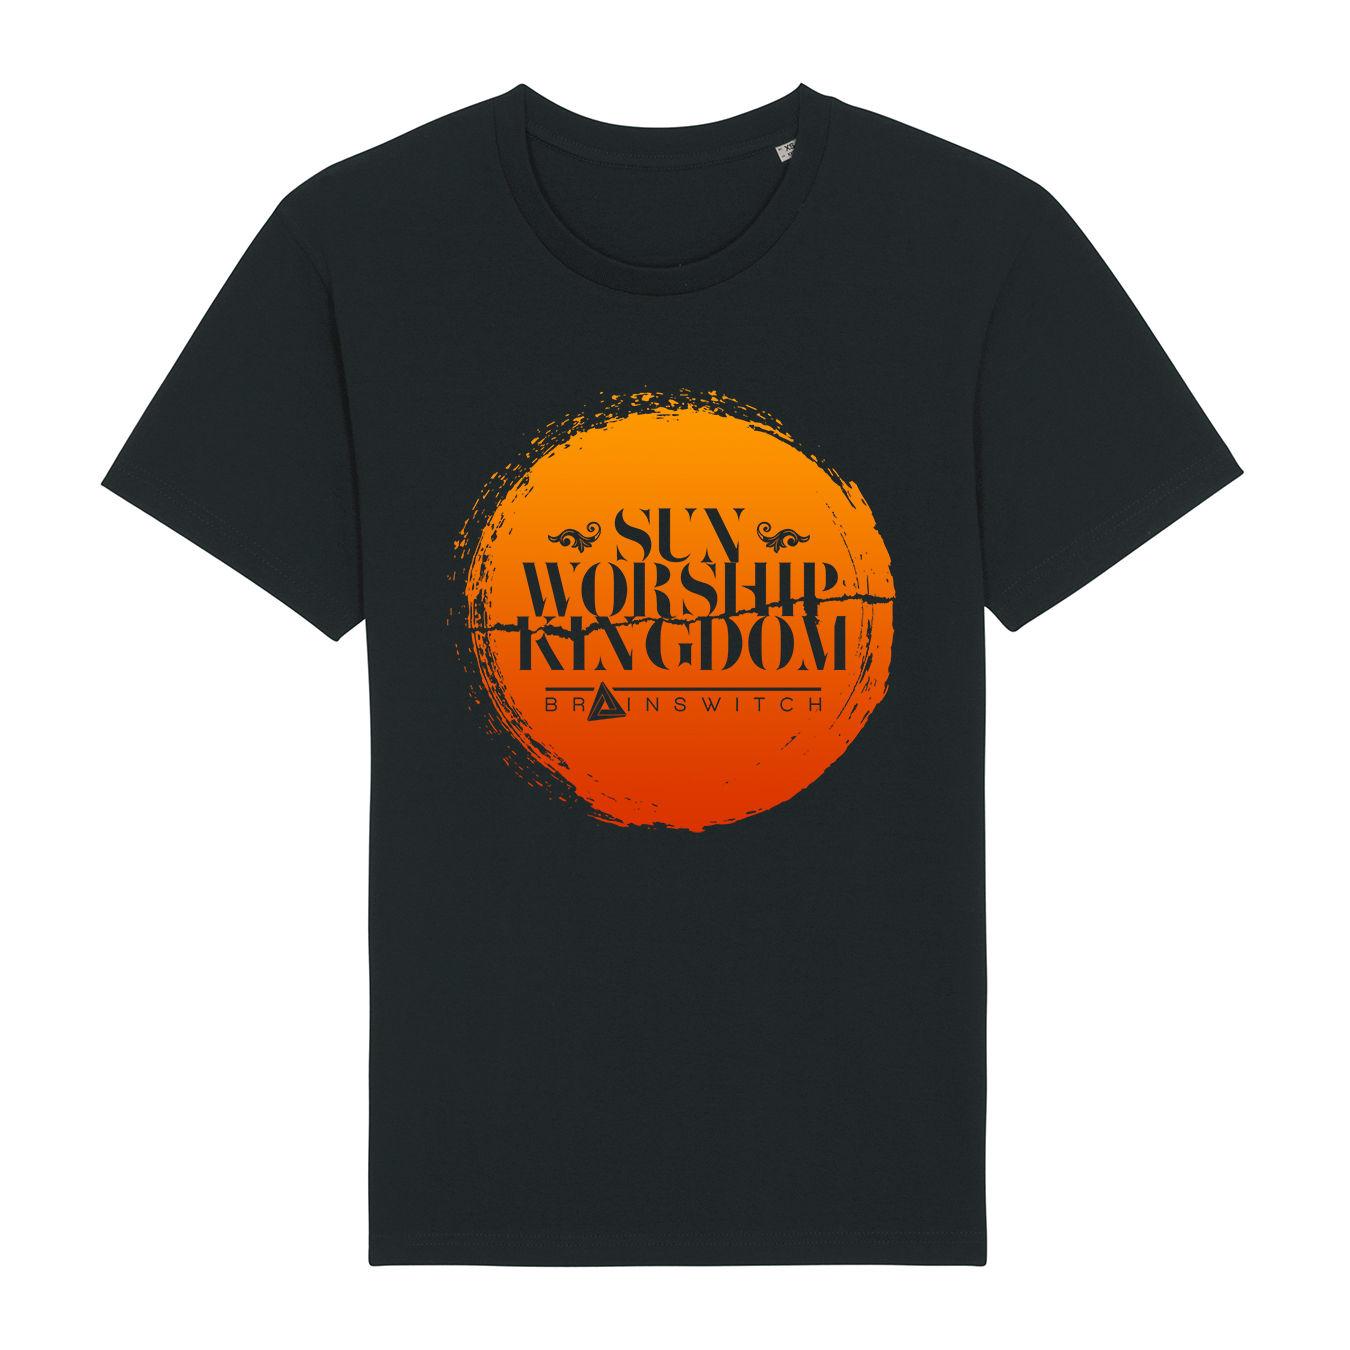 BRAINSWITCH - Sun Worship Kingdom - T-Shirt